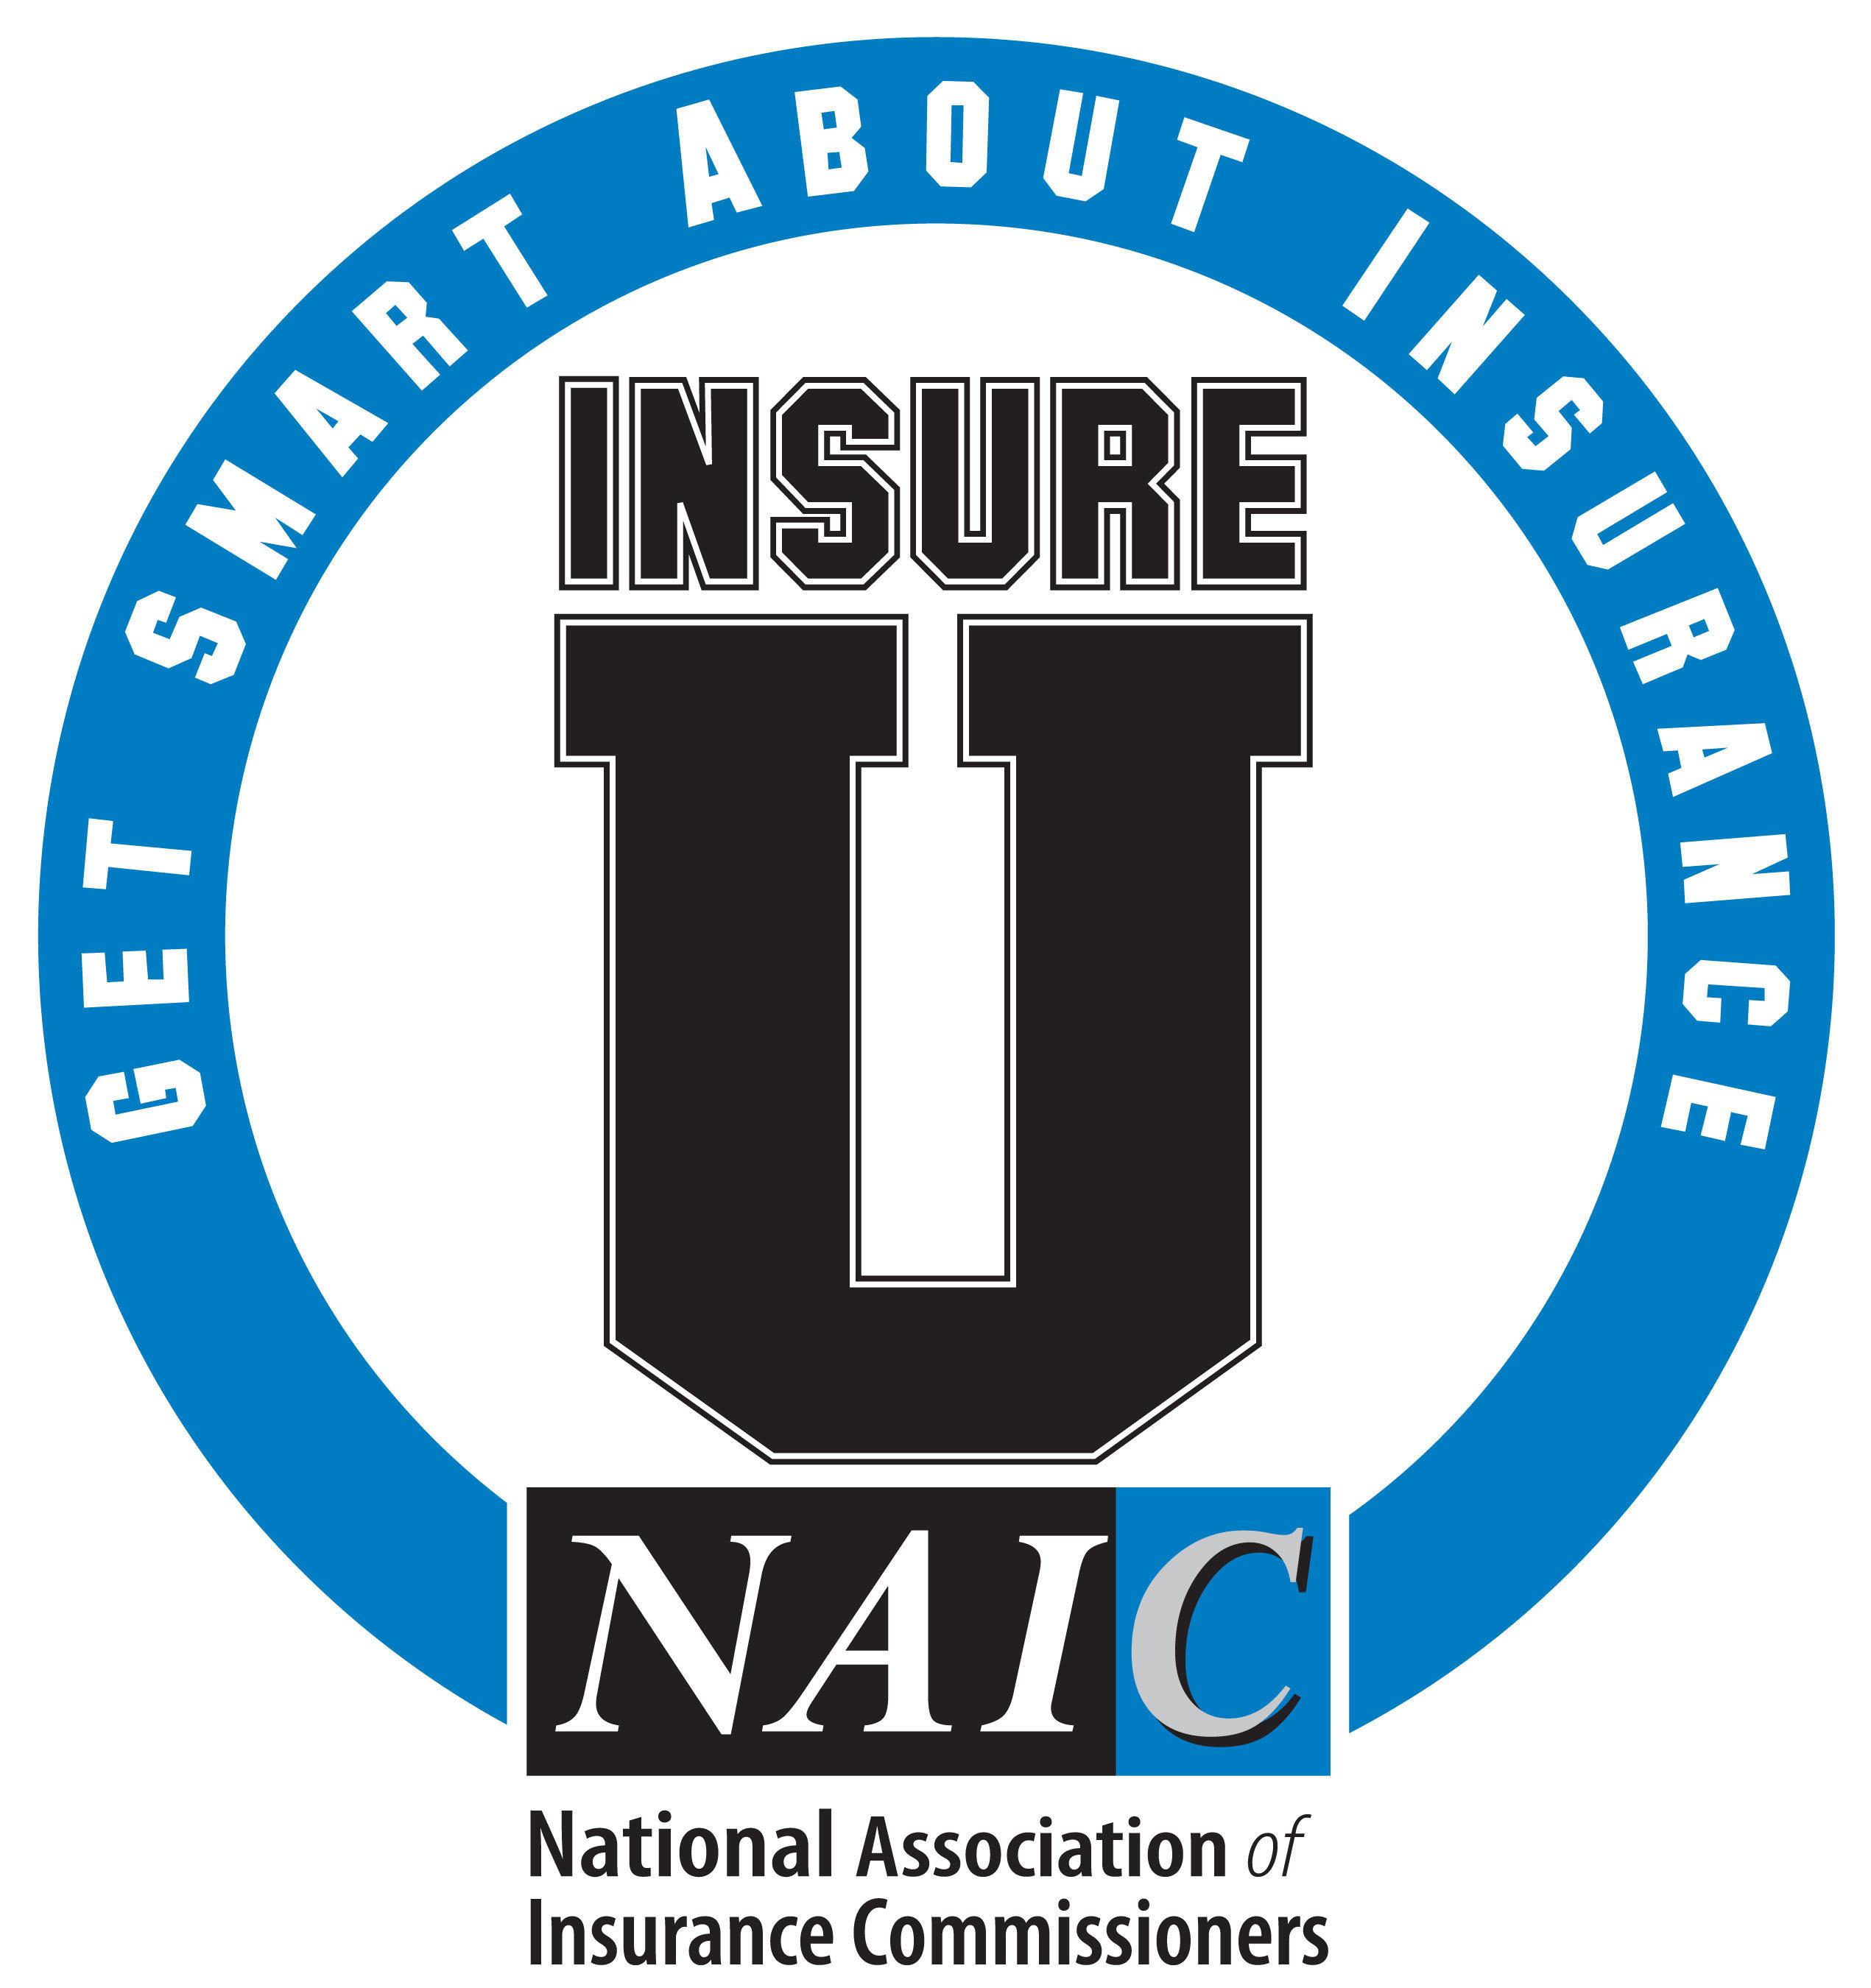 www.naic.org.